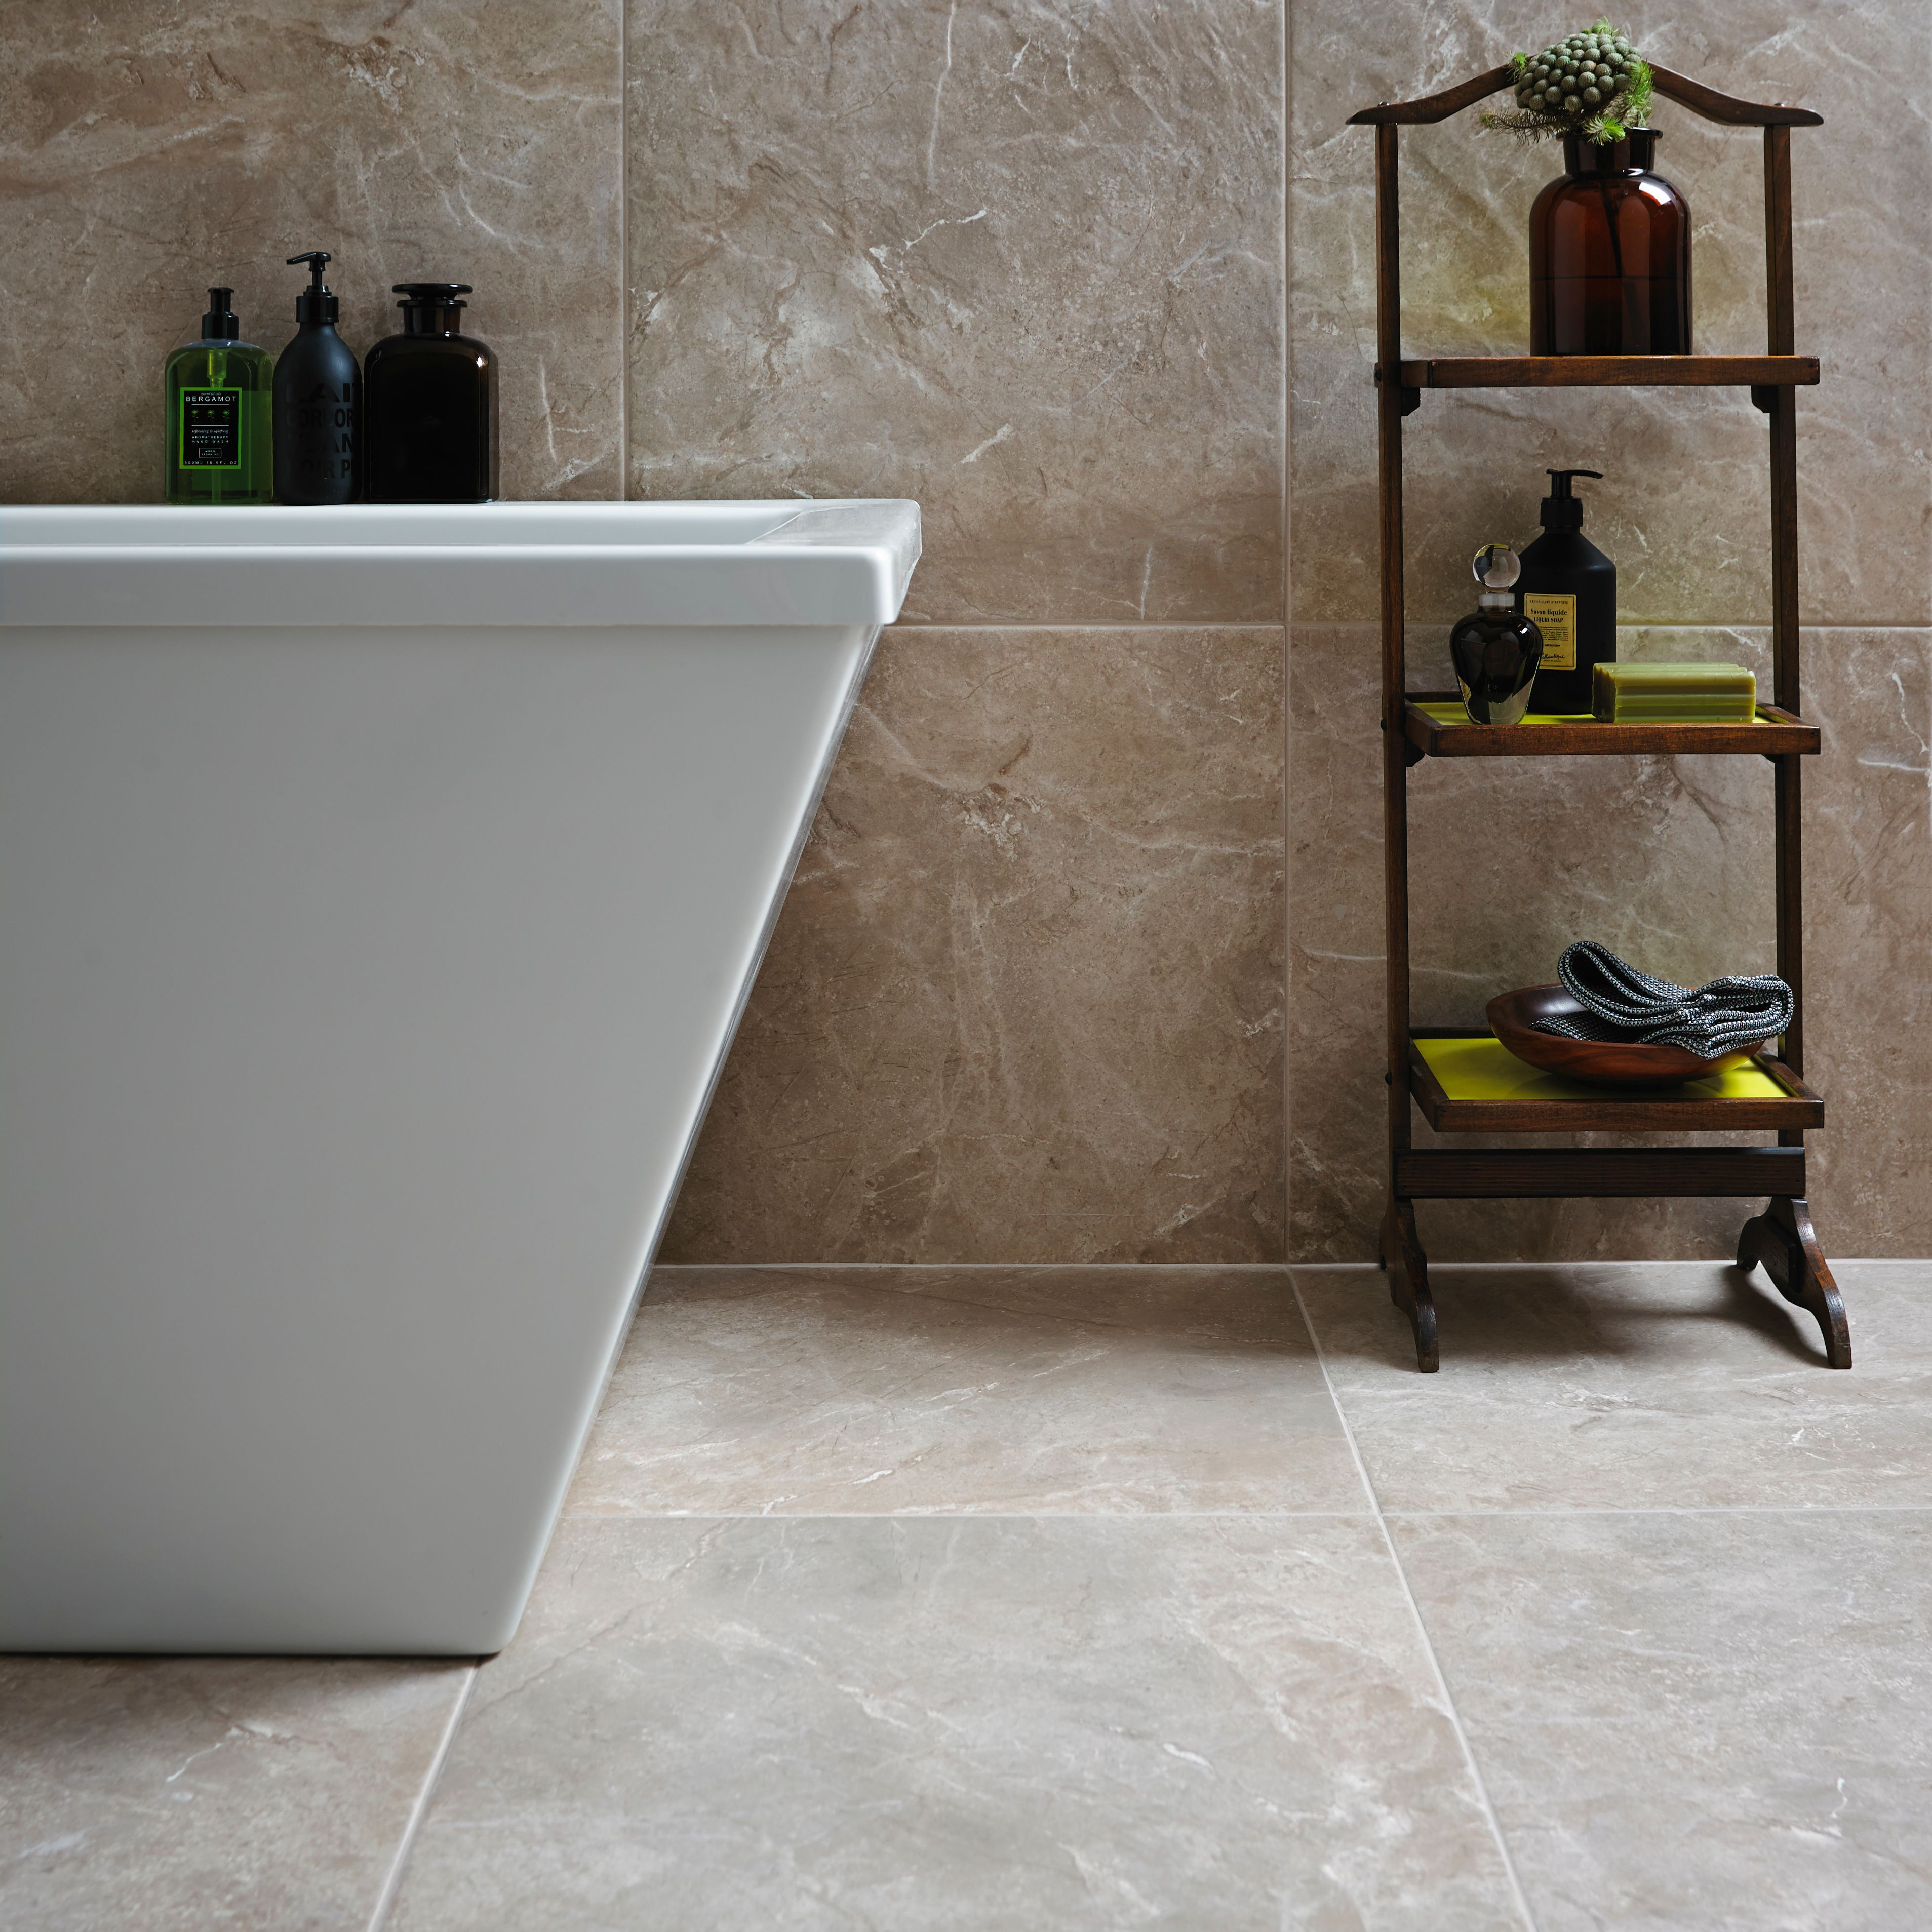 Burlington Limestone Earth Riven Stone Effect Ceramic Wall Floor Tile Pack Of 4 L 498mm W 498mm Departments Diy At B Q Tile Floor Flooring Tiles